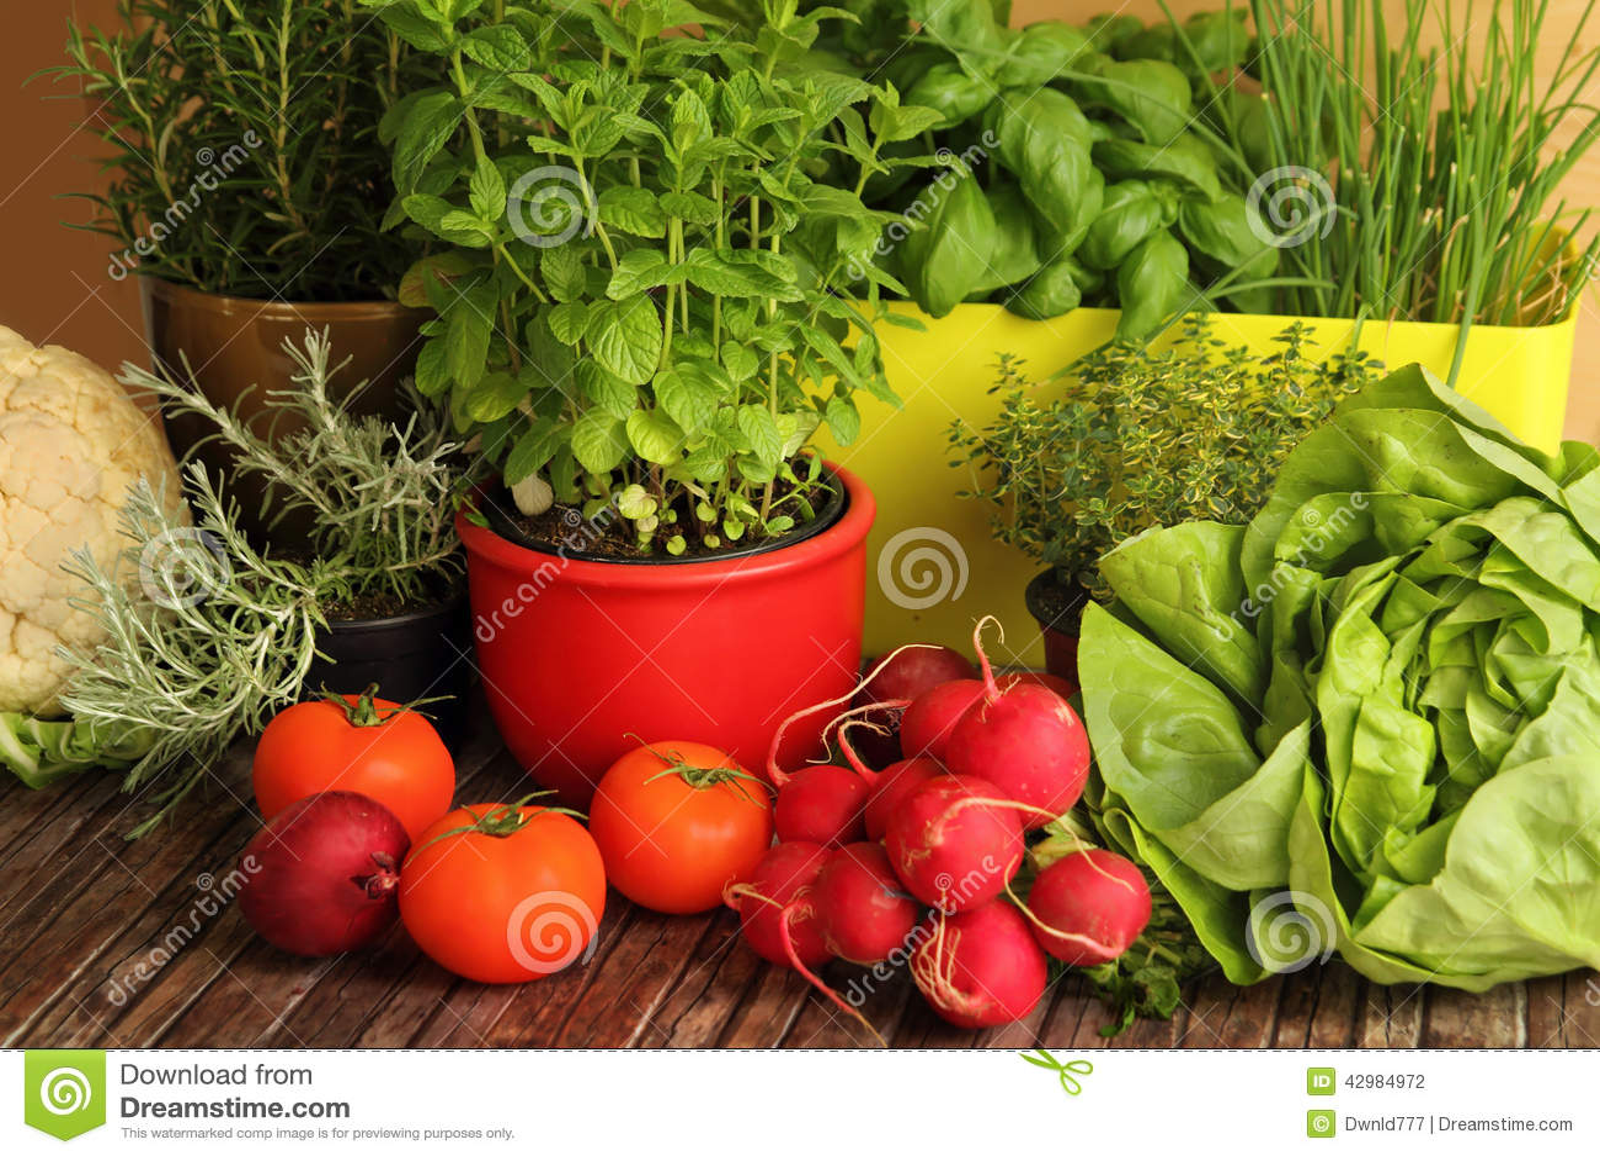 Homegrown χορτάρια και λαχανικά